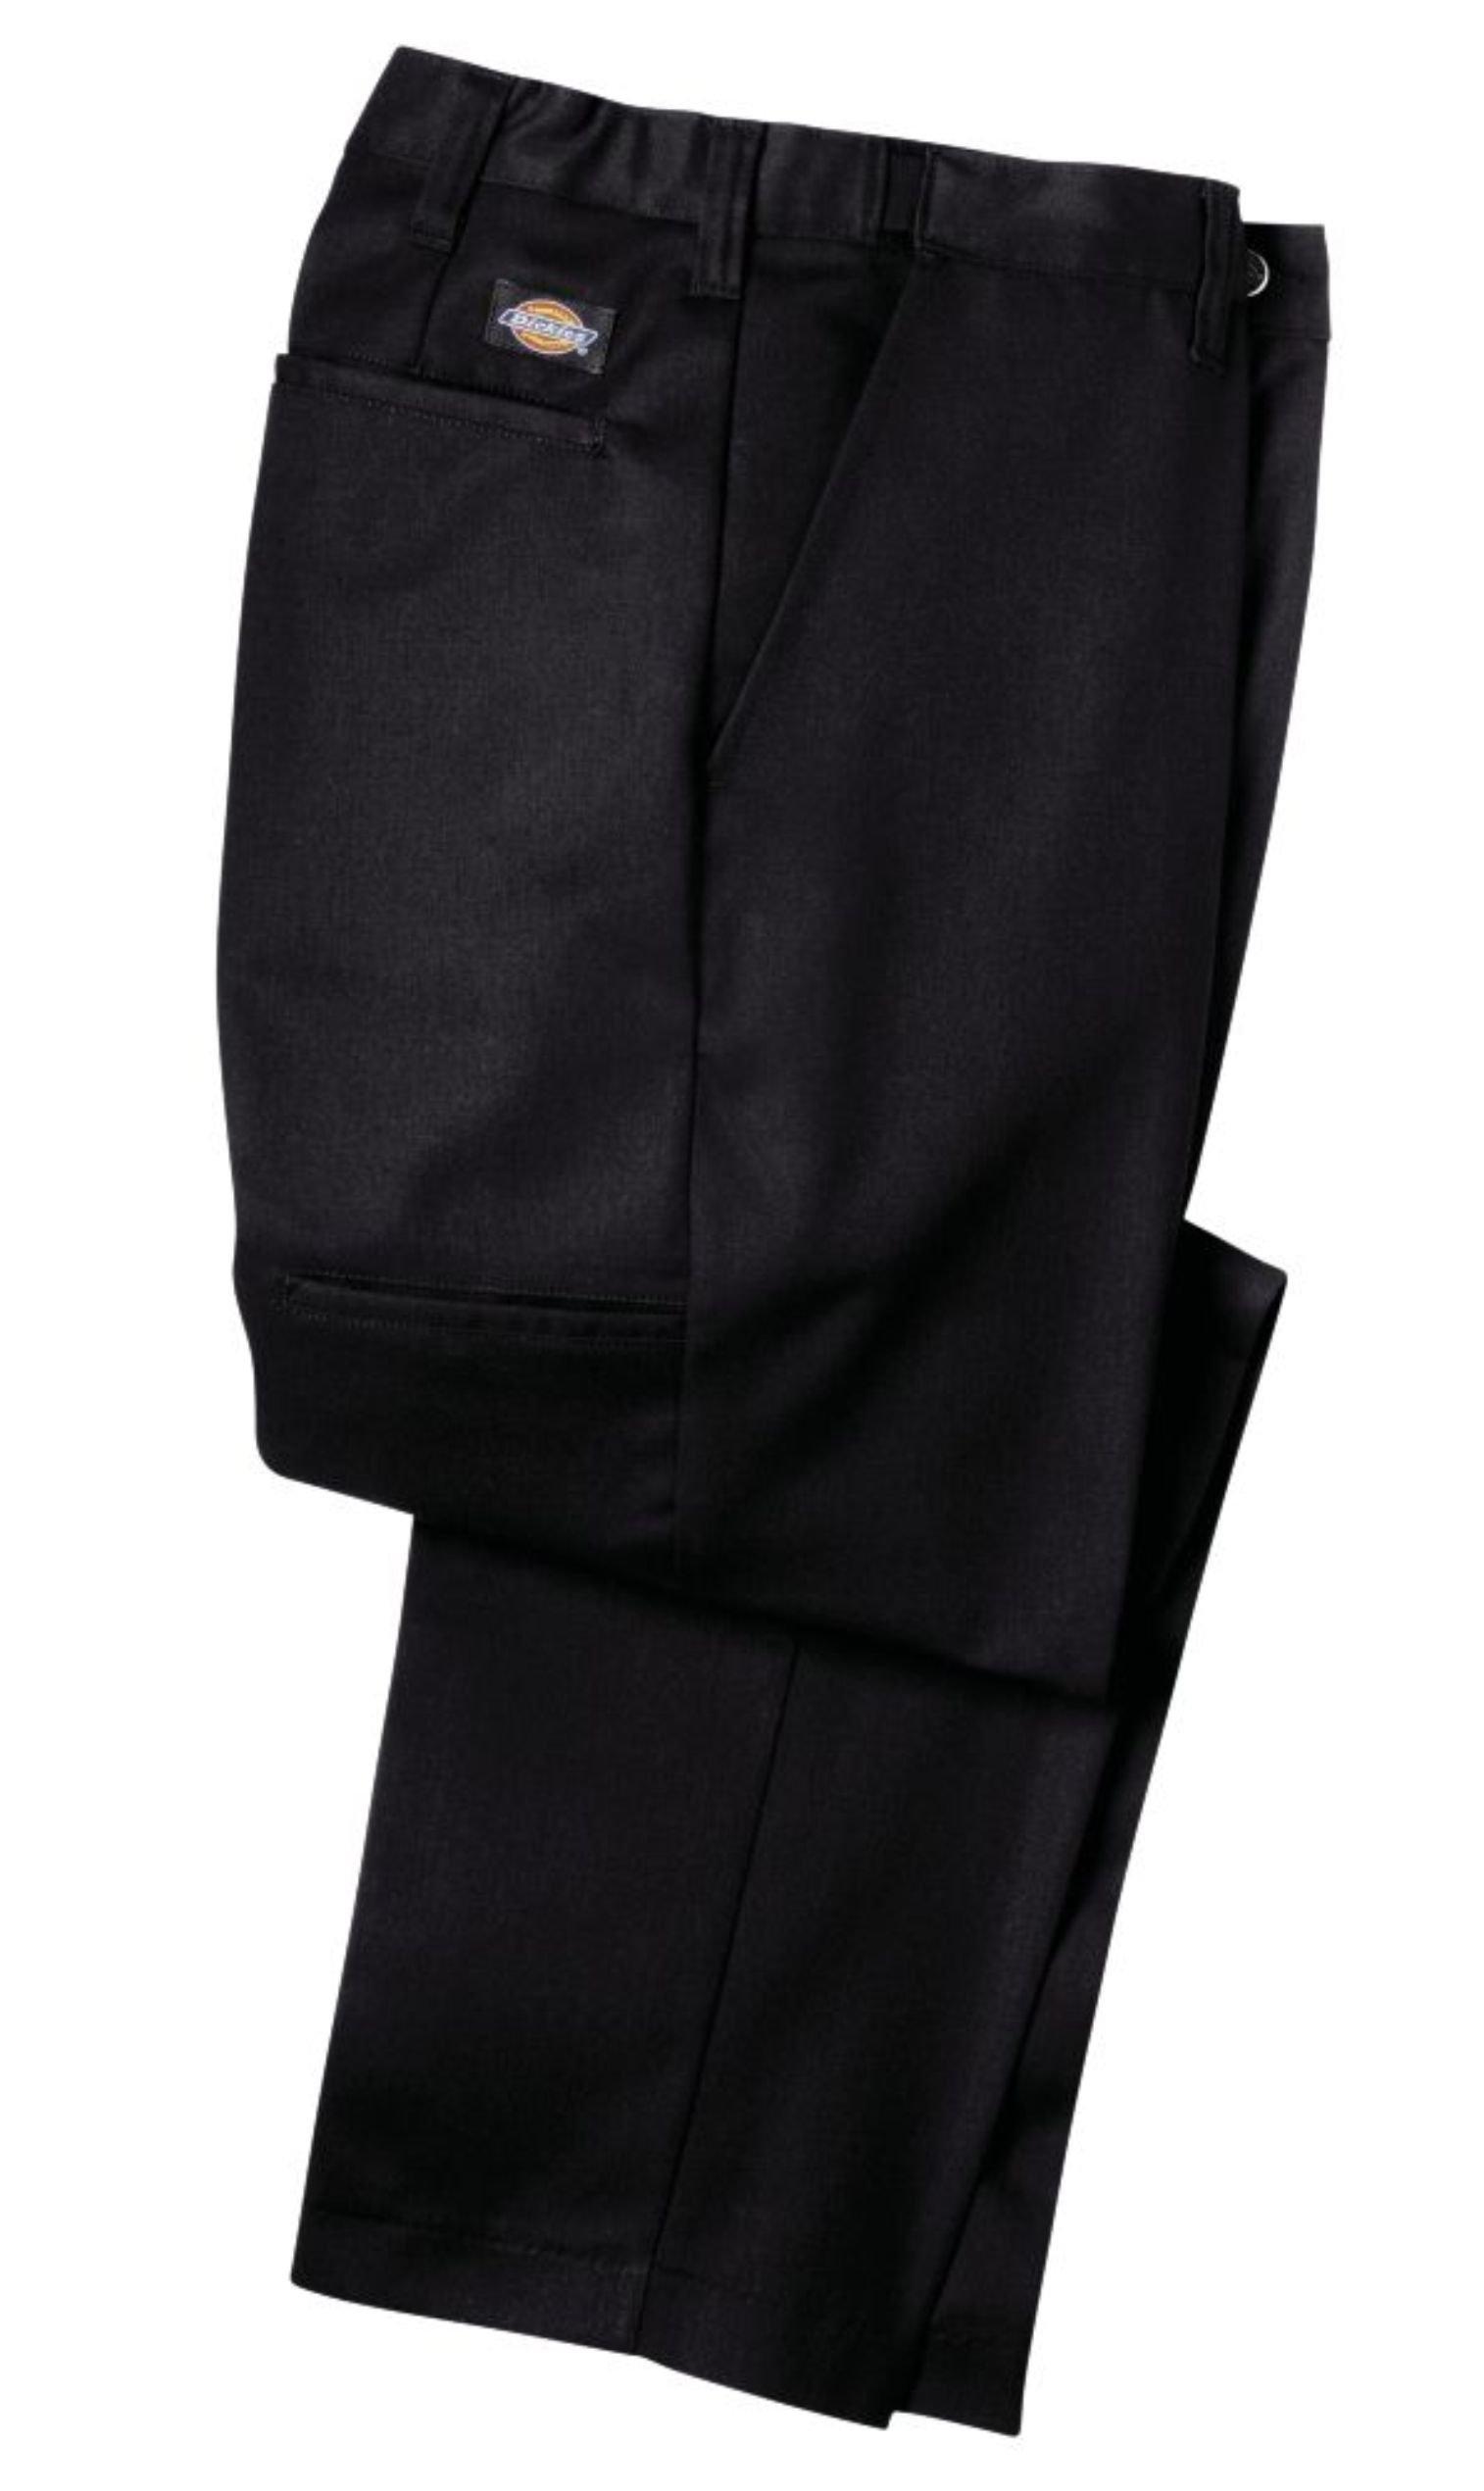 Dickies LP700 Flat Front Comfort Waist Pant-BLACK-32x30